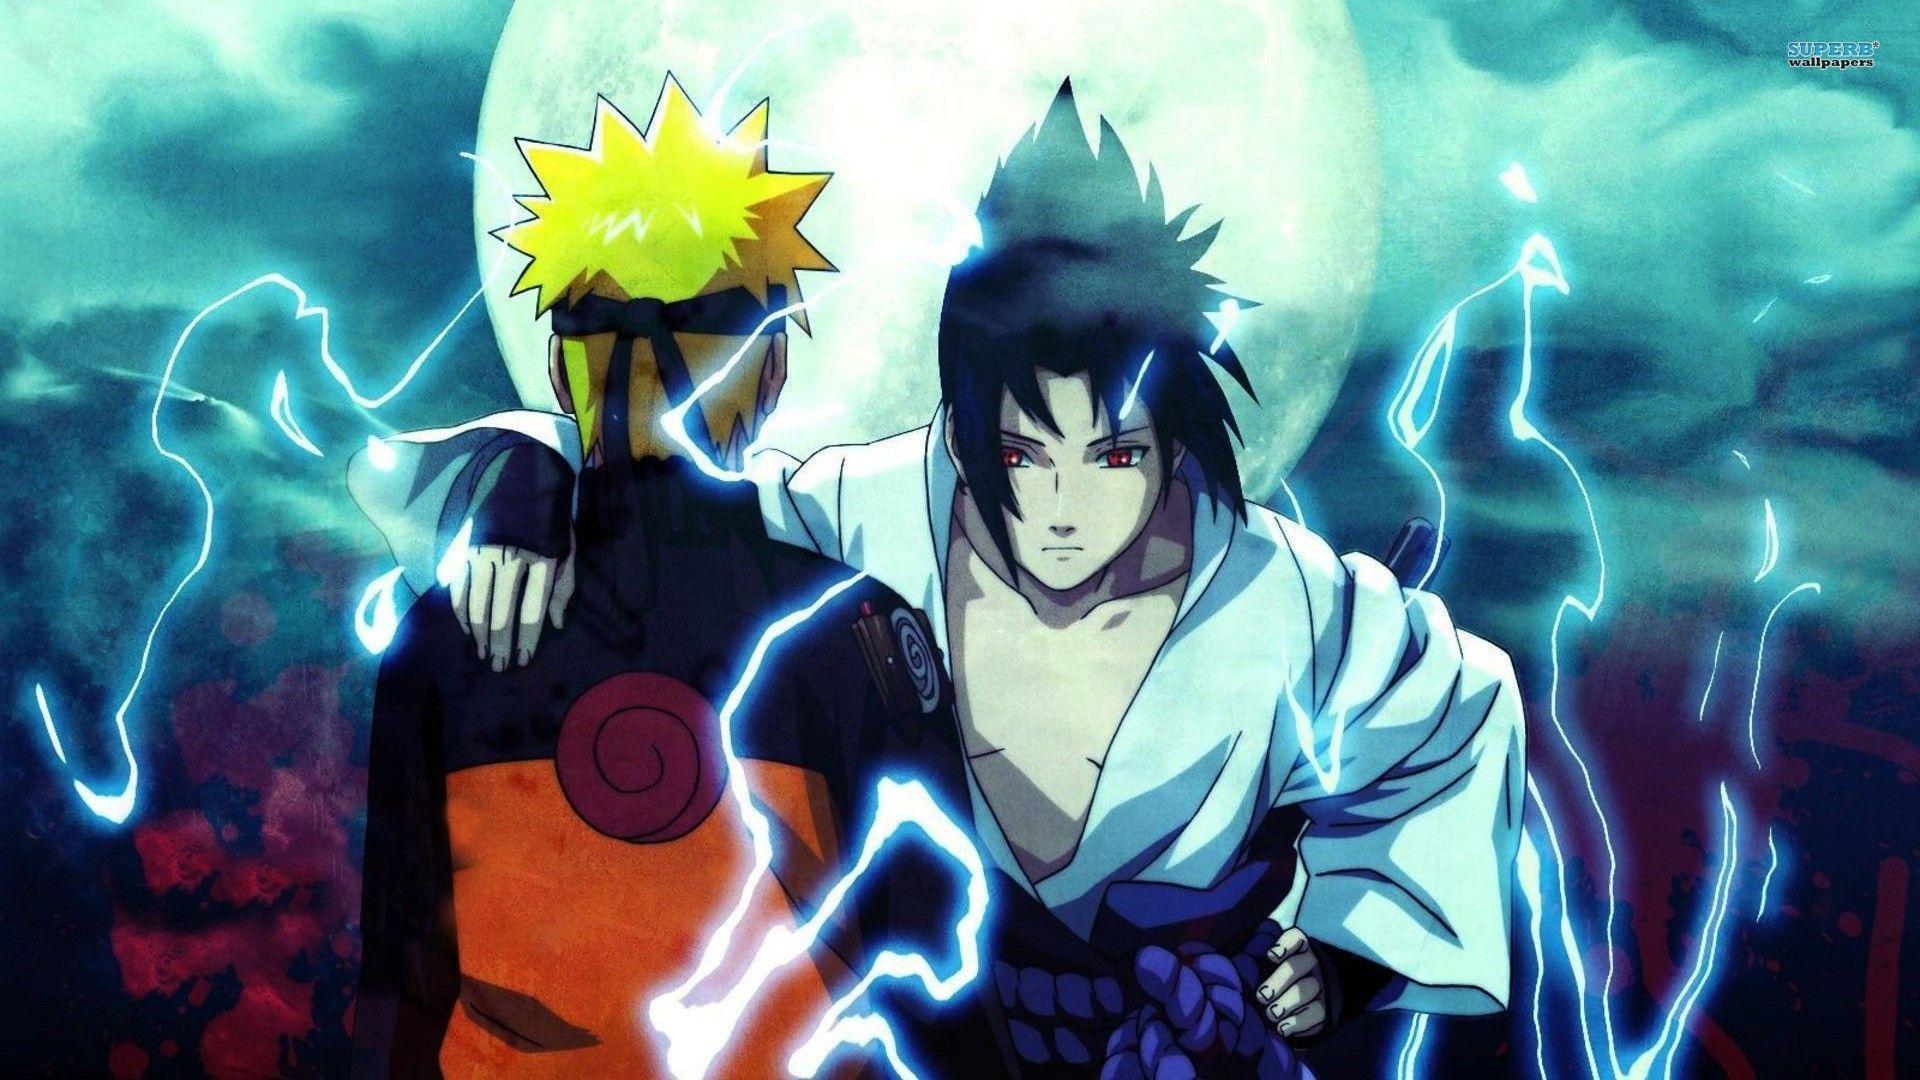 Wallpapers For > Naruto Wallpaper Hd 1080p